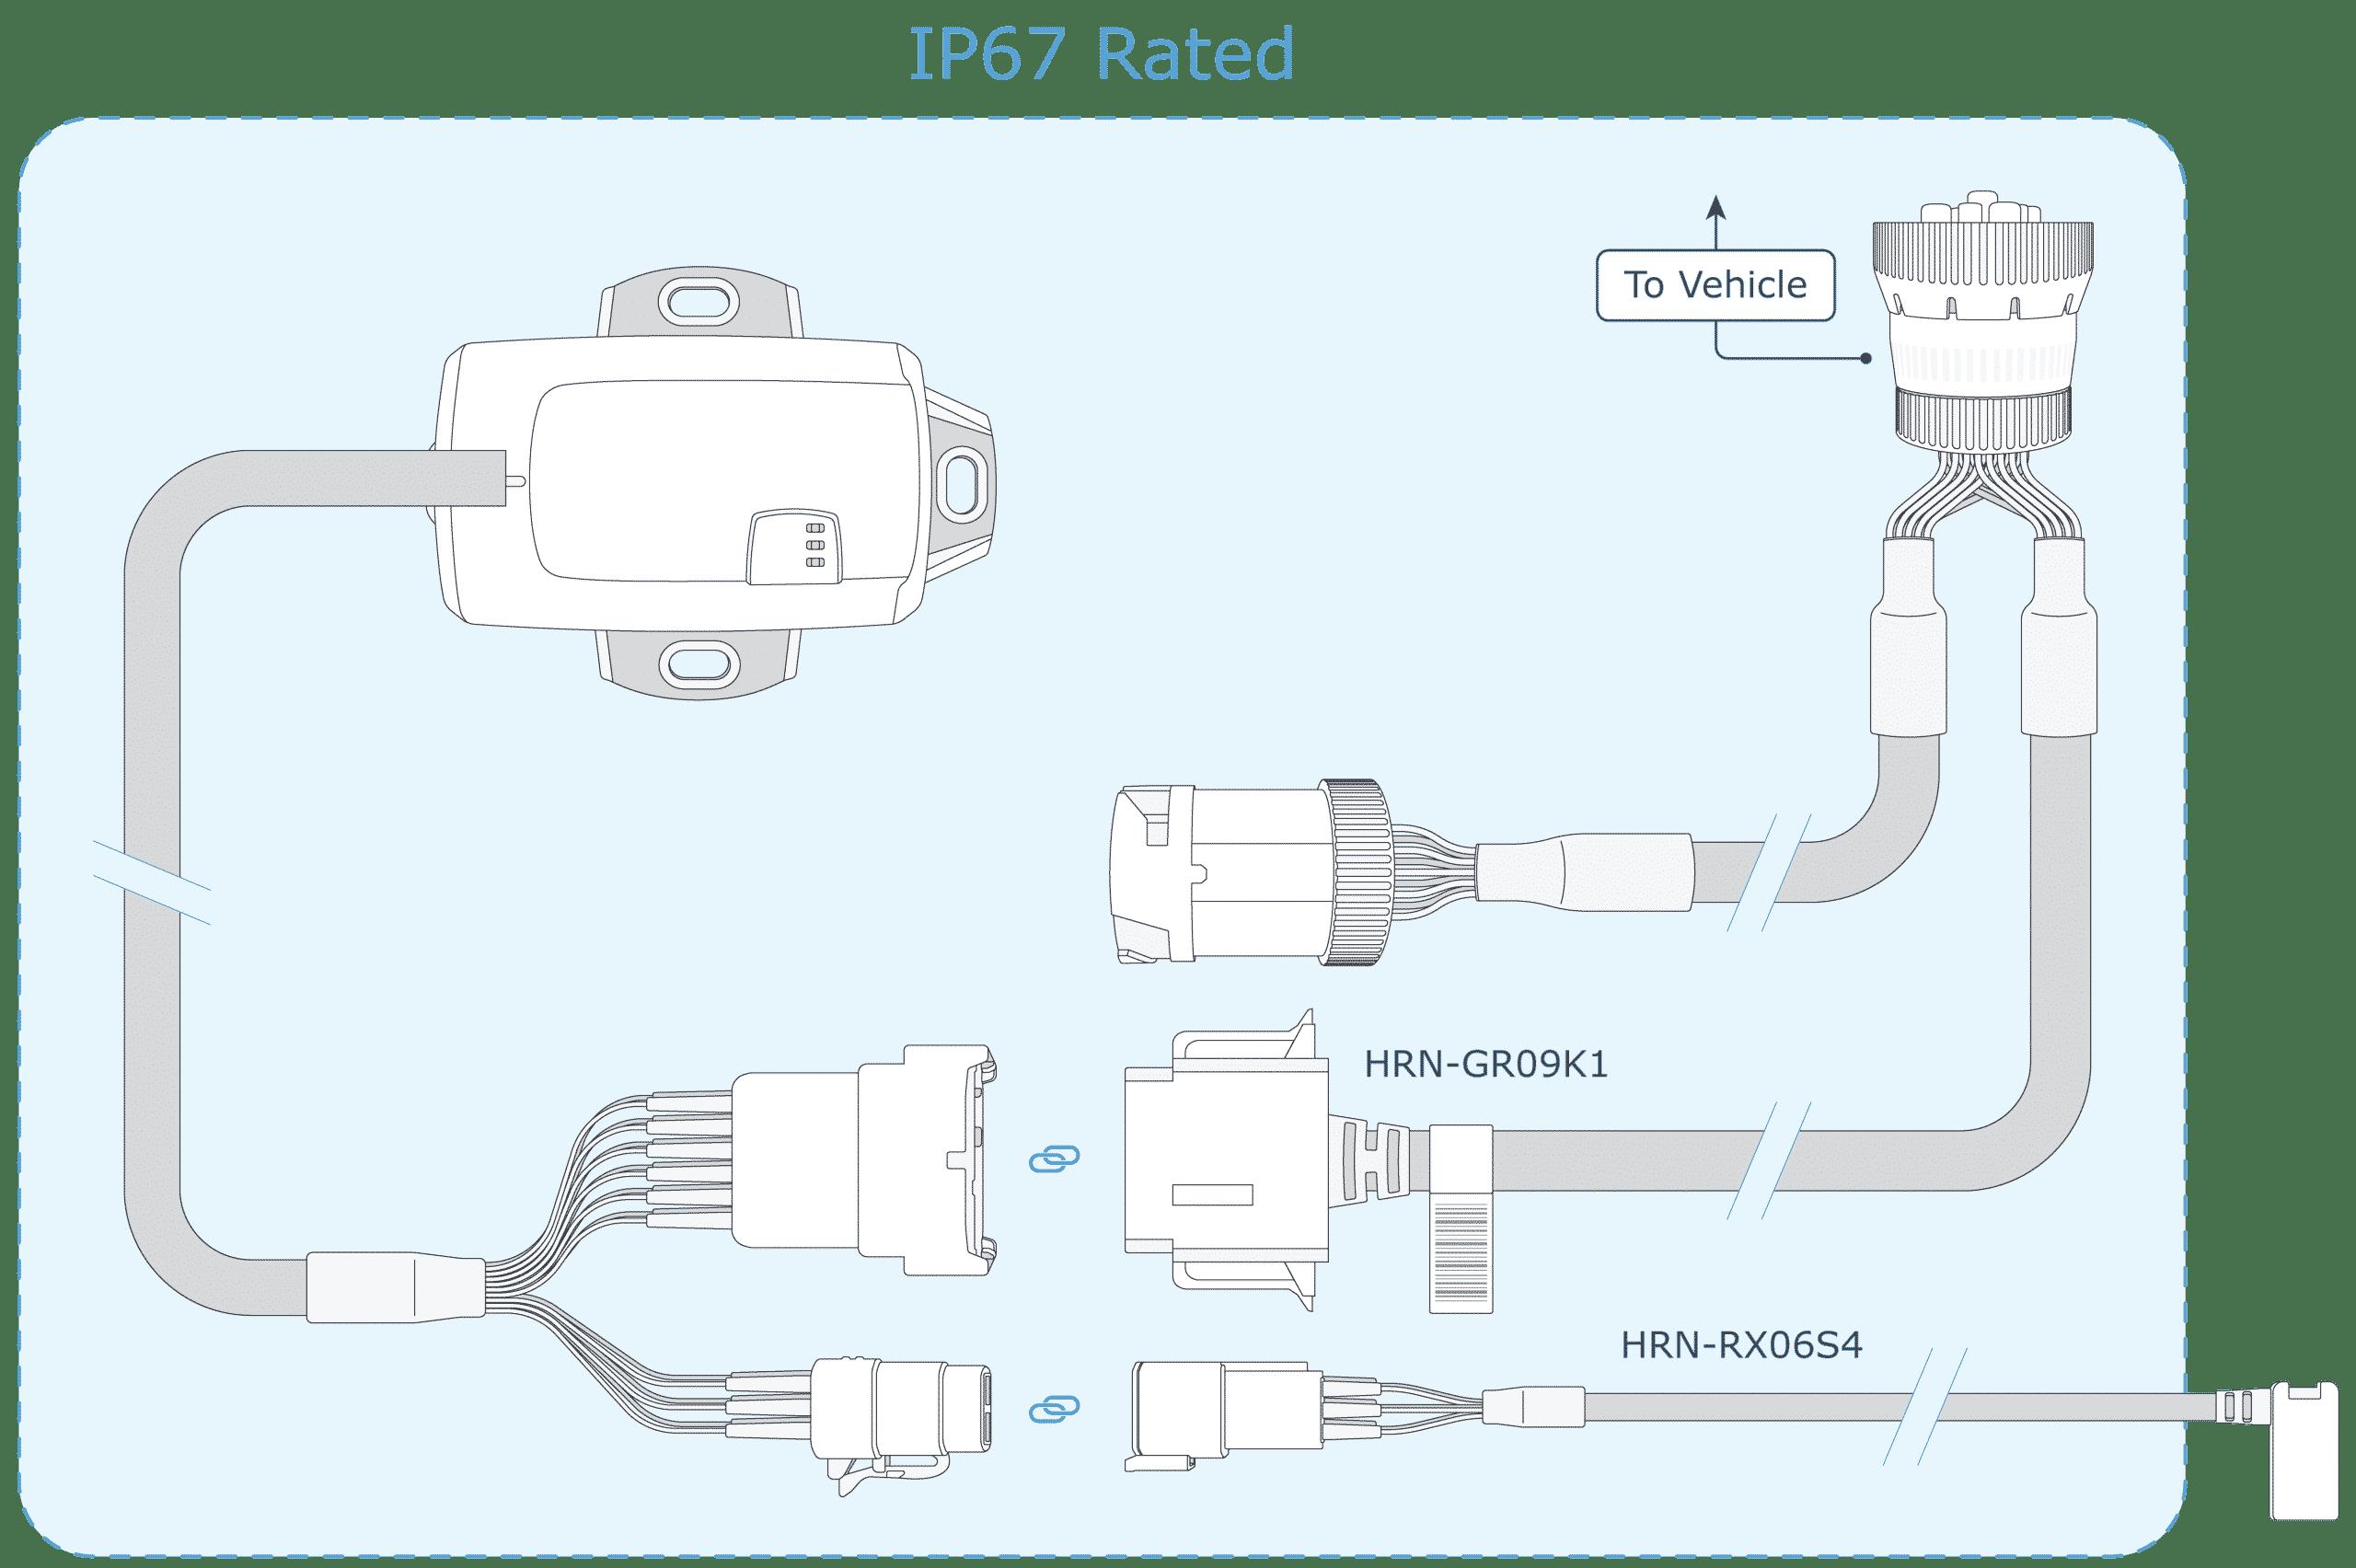 Skizze: Geotab HRN-GR09K1 und HRN-RX06S4